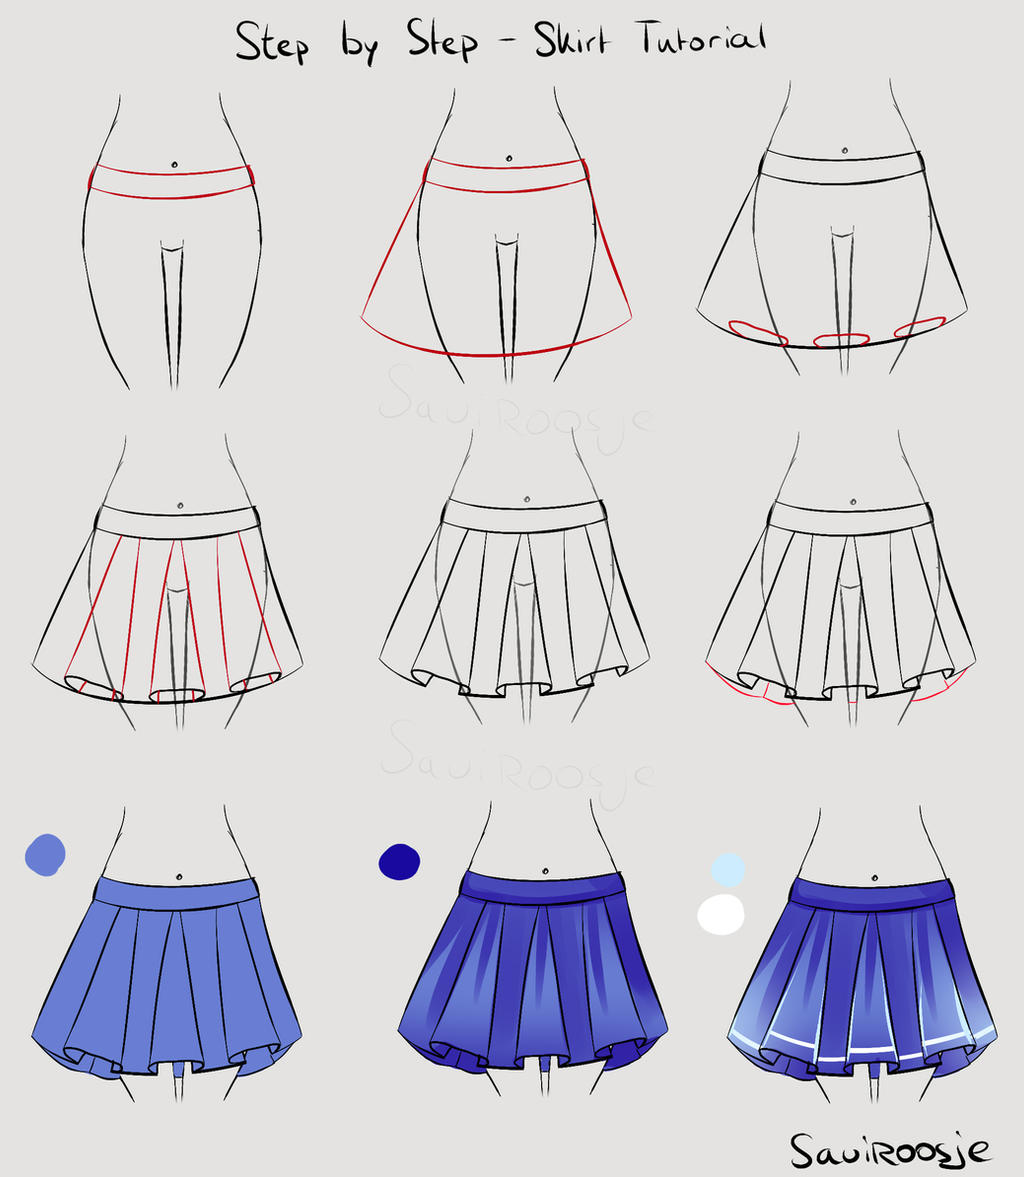 Step by Step - School girl Skirt by Saviroosje on DeviantArt